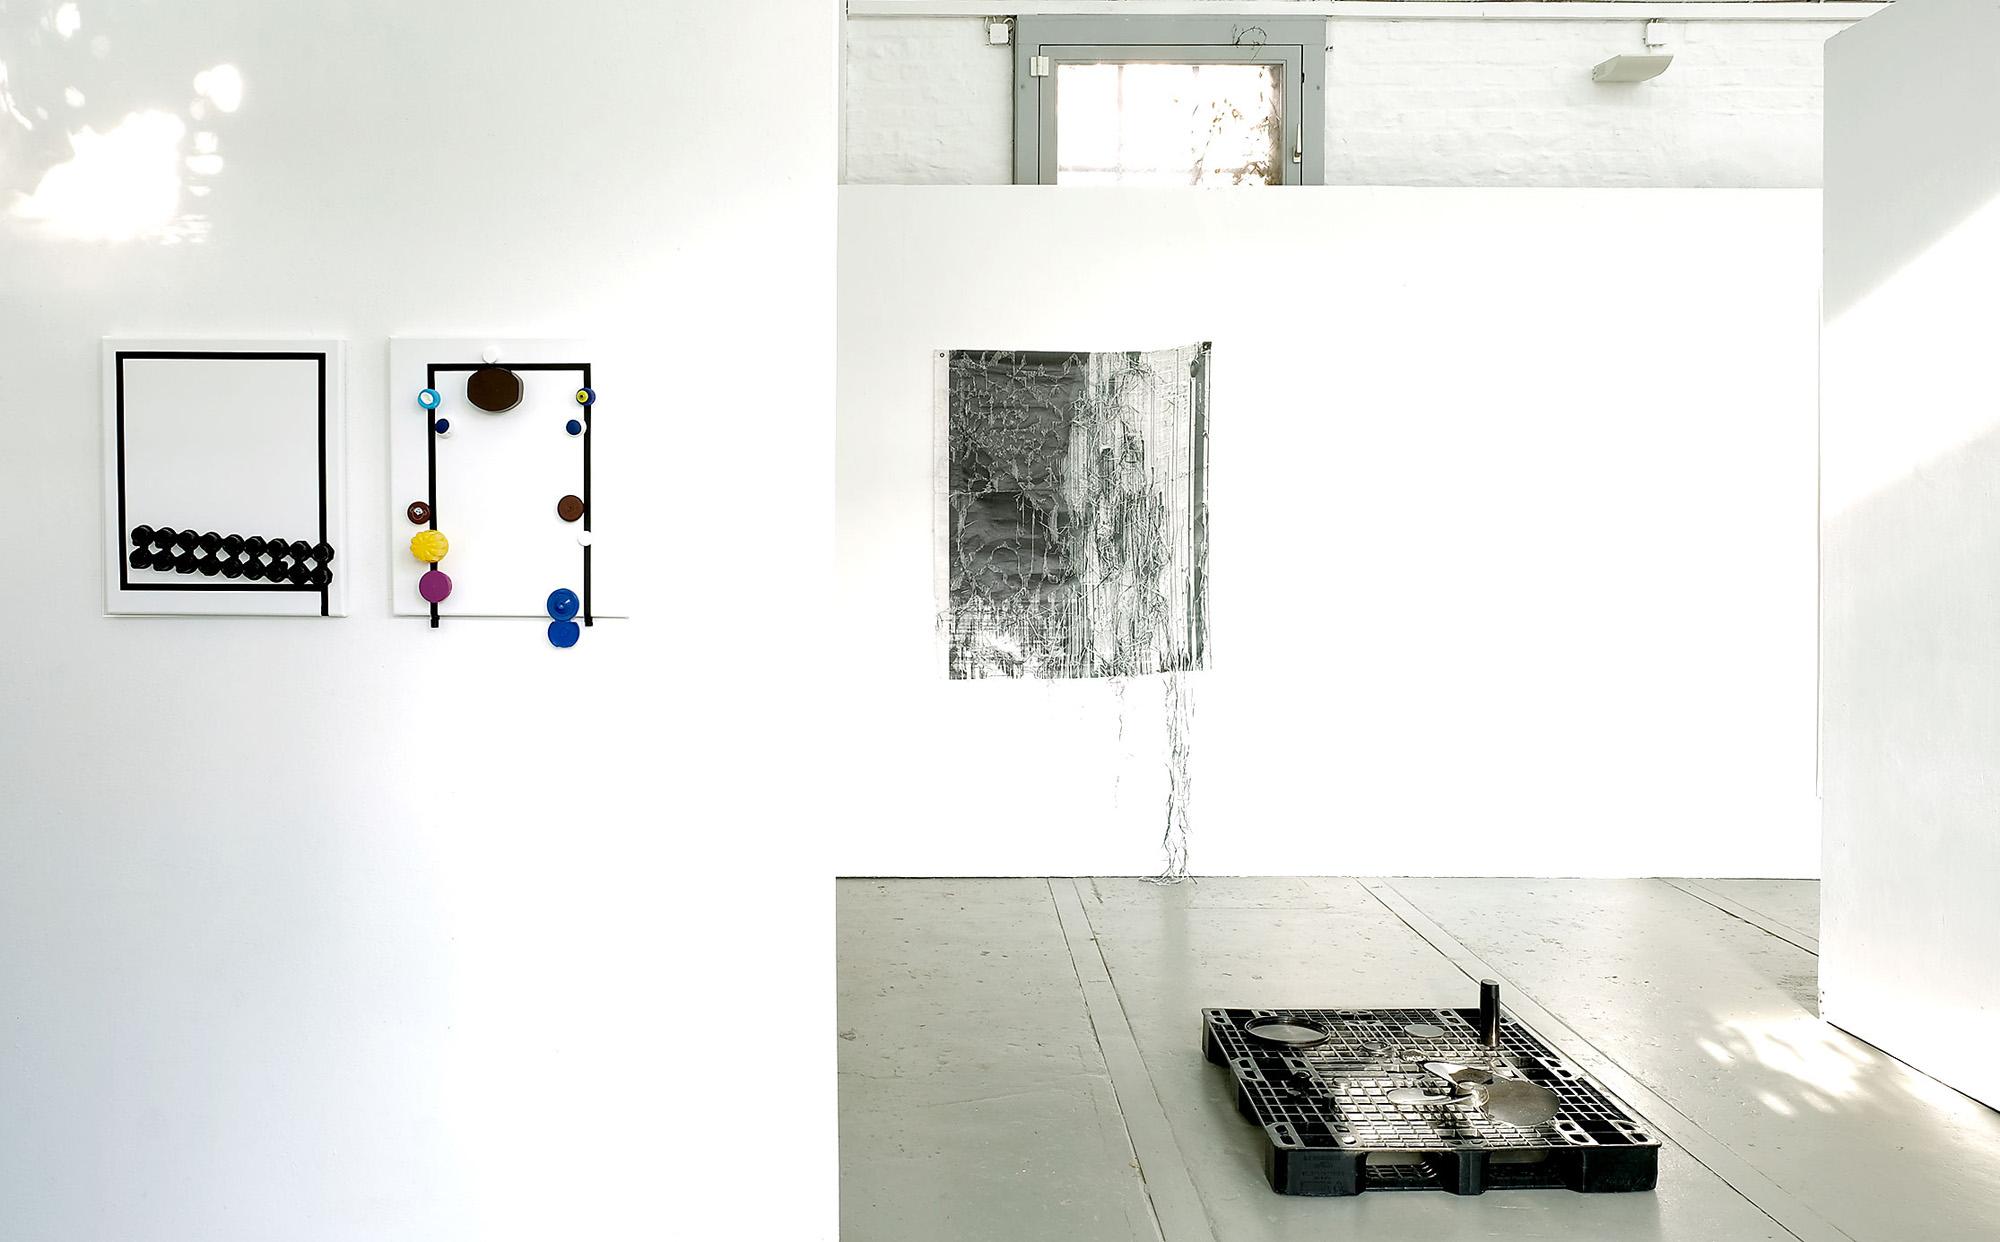 10. Klaus-Martin Treder